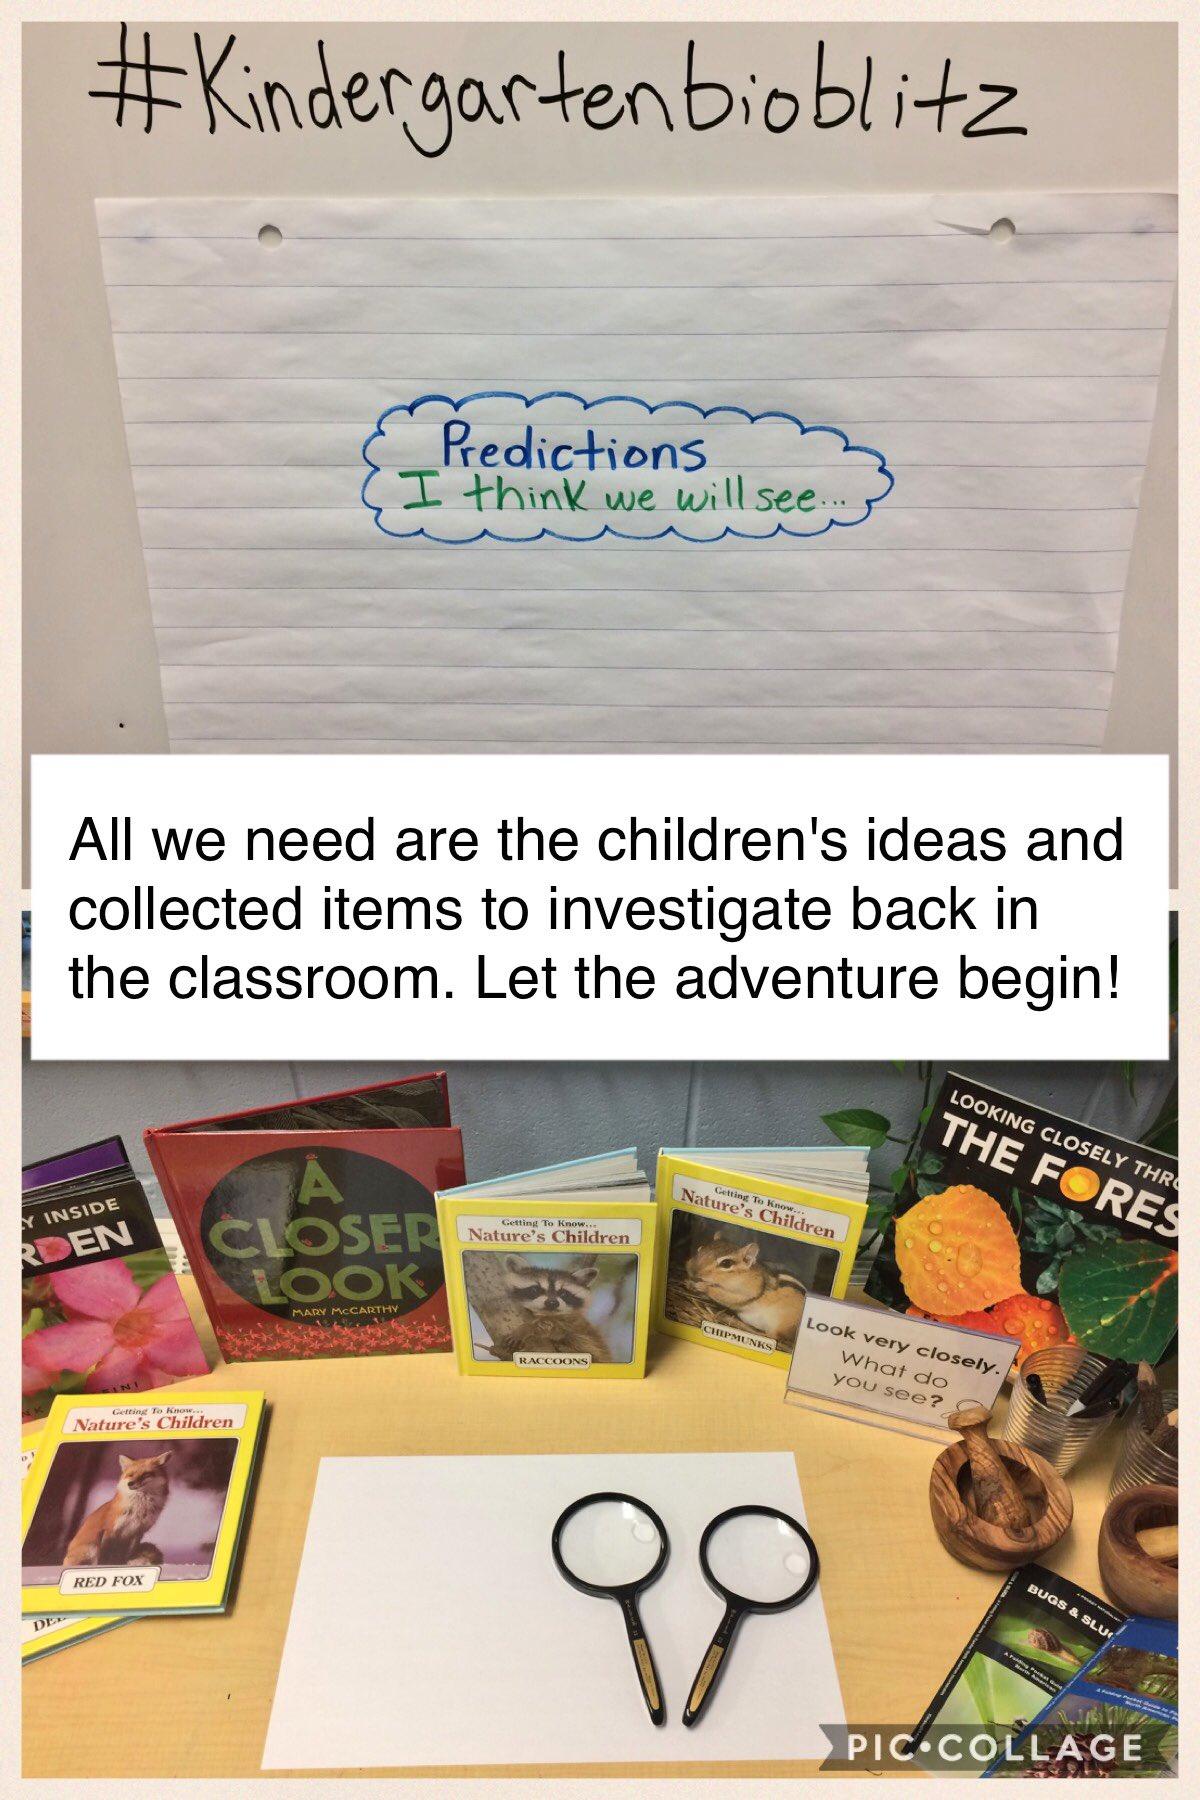 Thumbnail for #KindergartenBioBlitz Seasons Changing Edition Feb 27-Mar 3, 2017